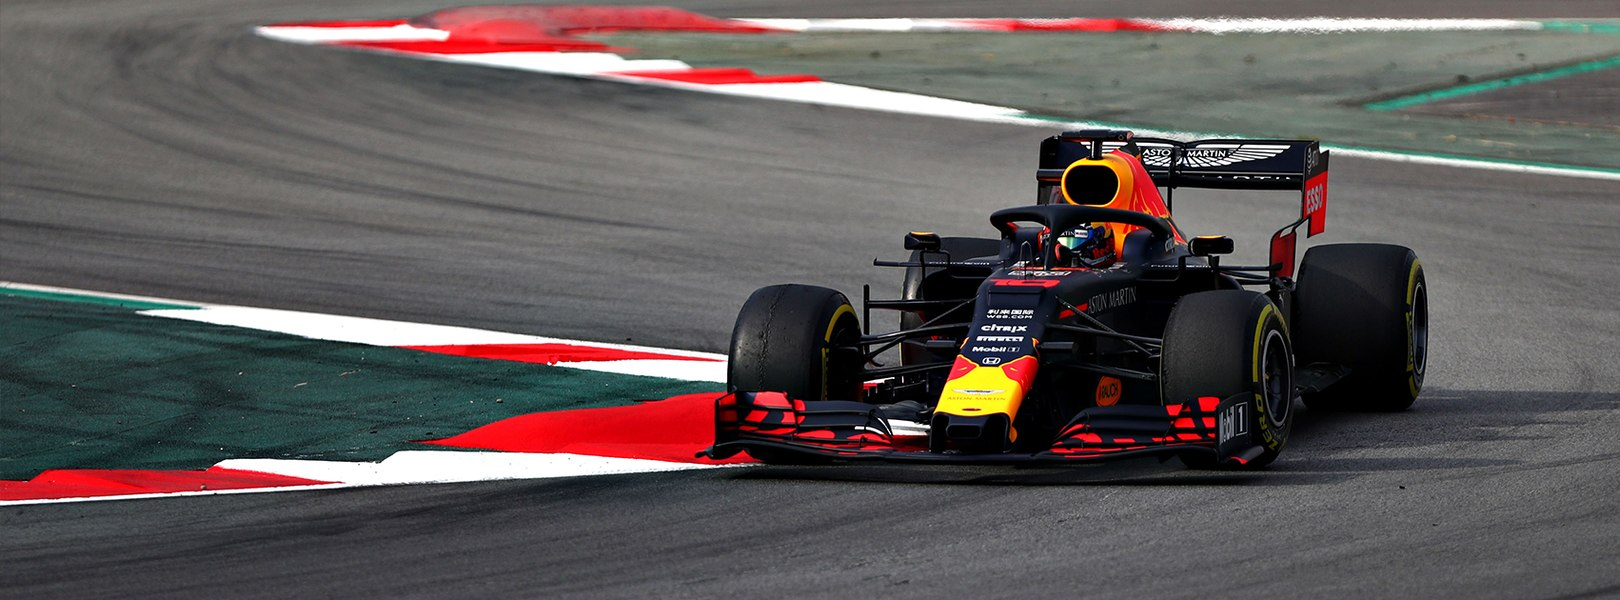 F1_testing_day2_0042